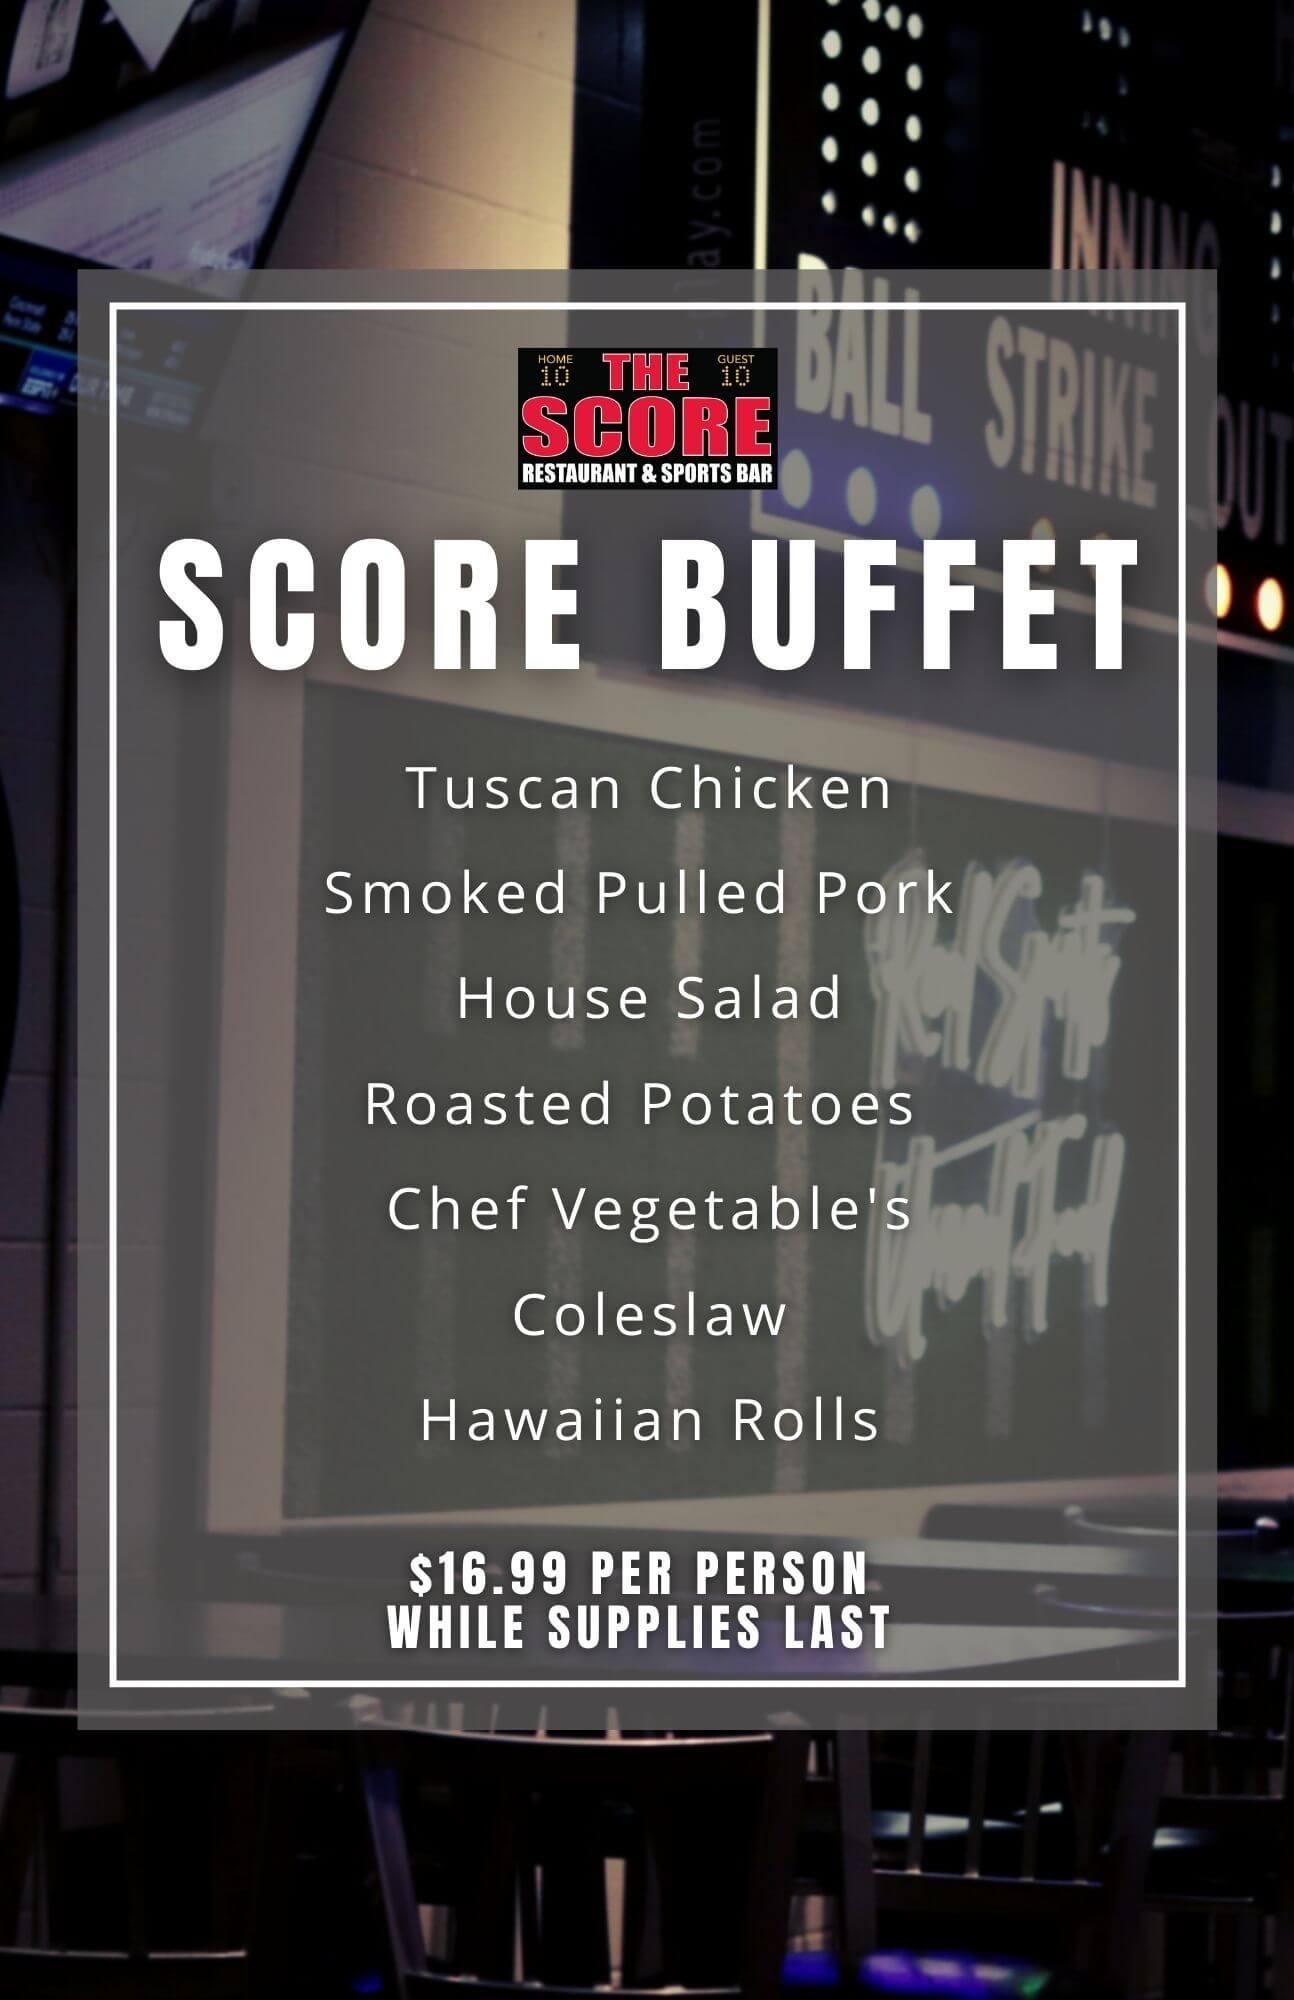 The Score buffet menu